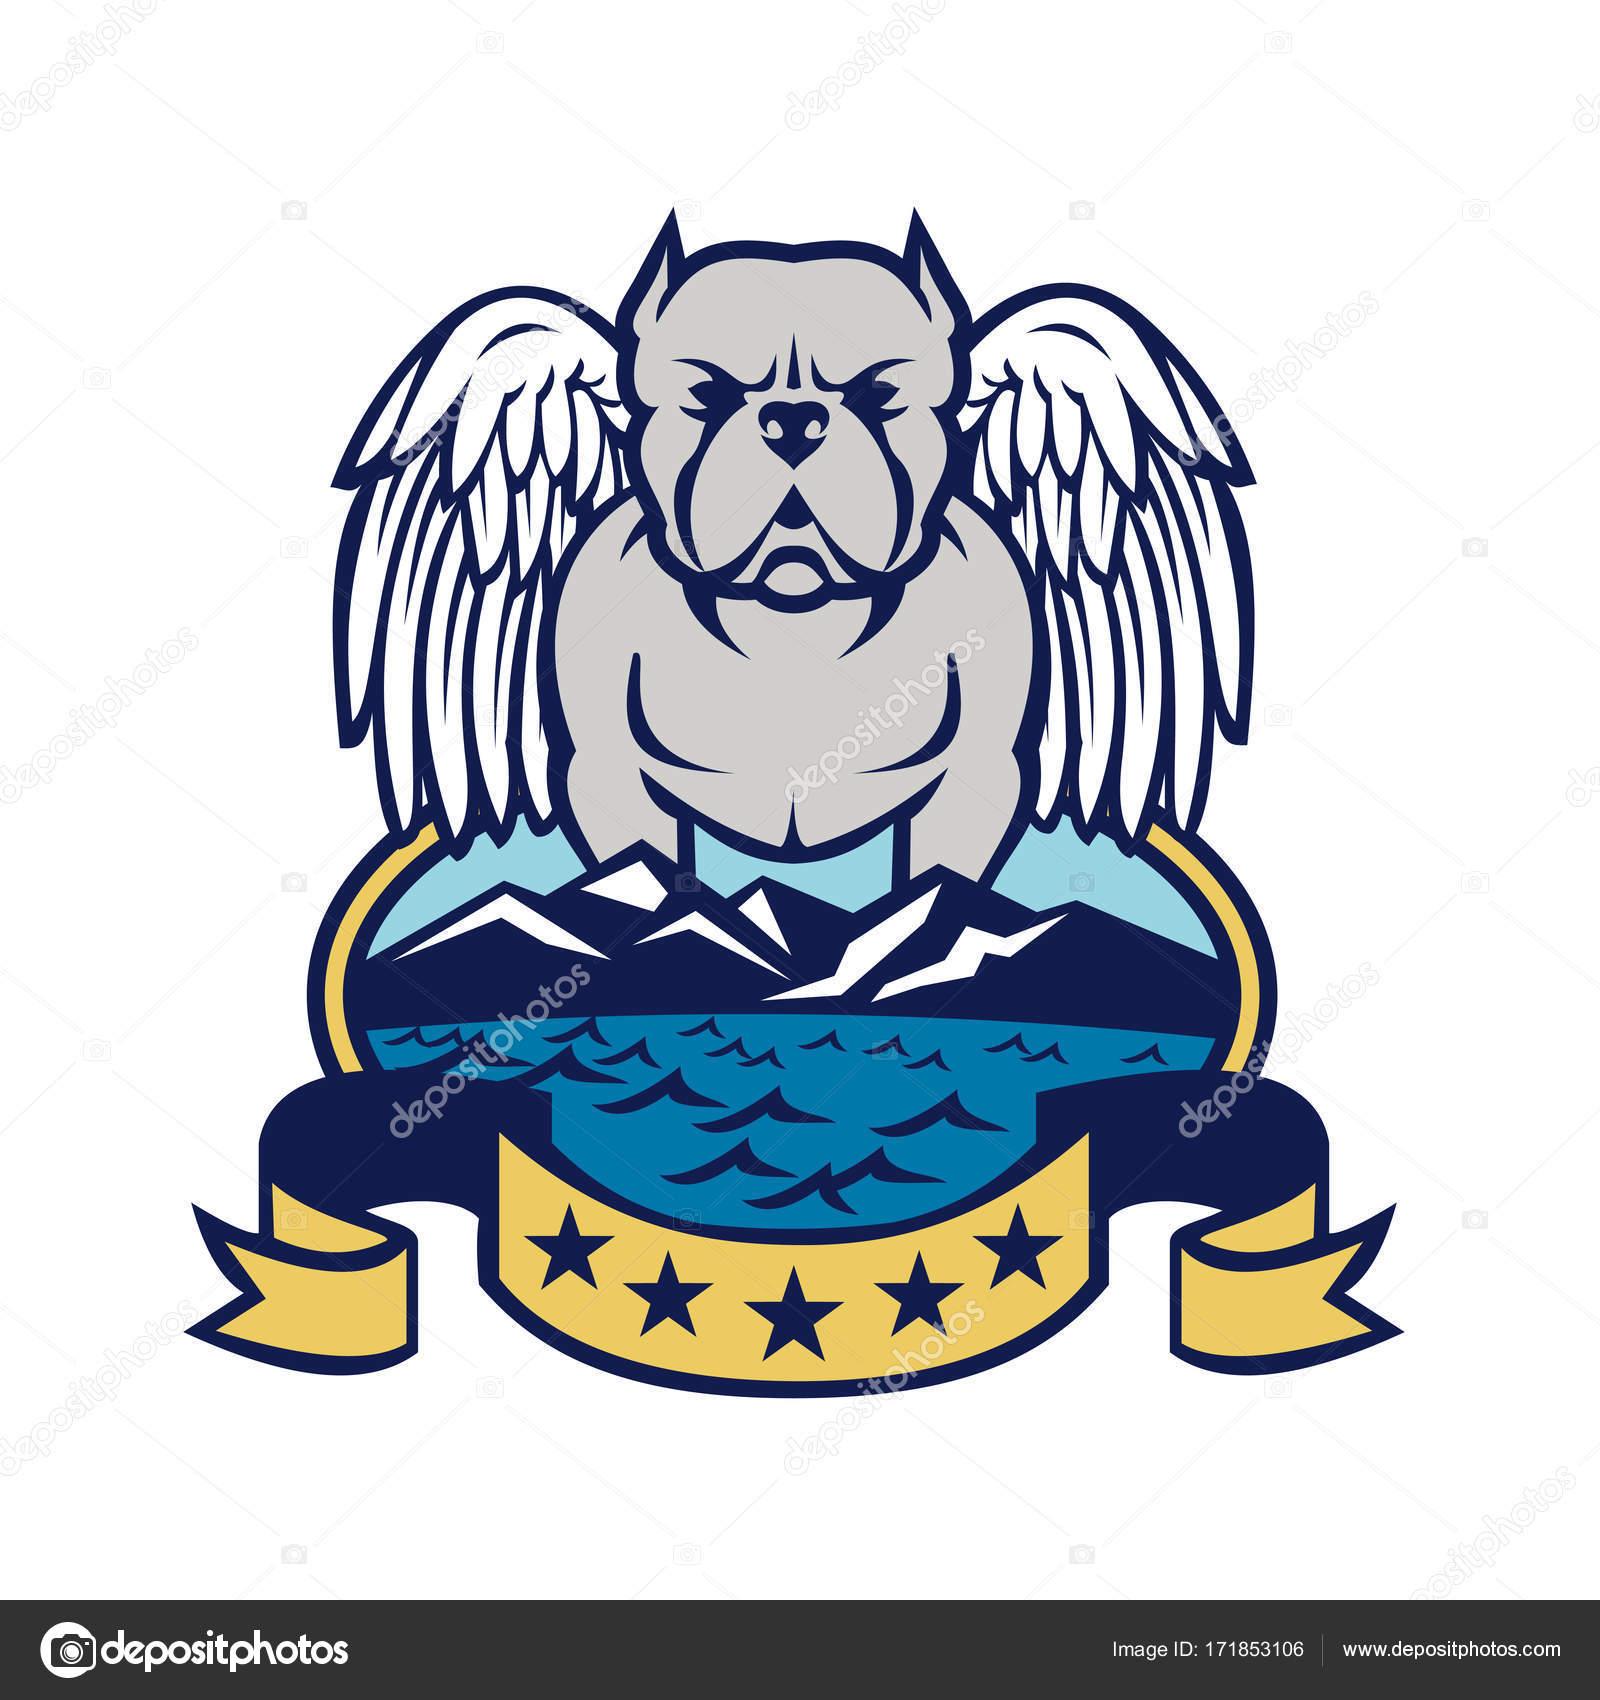 American bully dog angel wings island stock vector patrimonio american bully dog angel wings island stock vector biocorpaavc